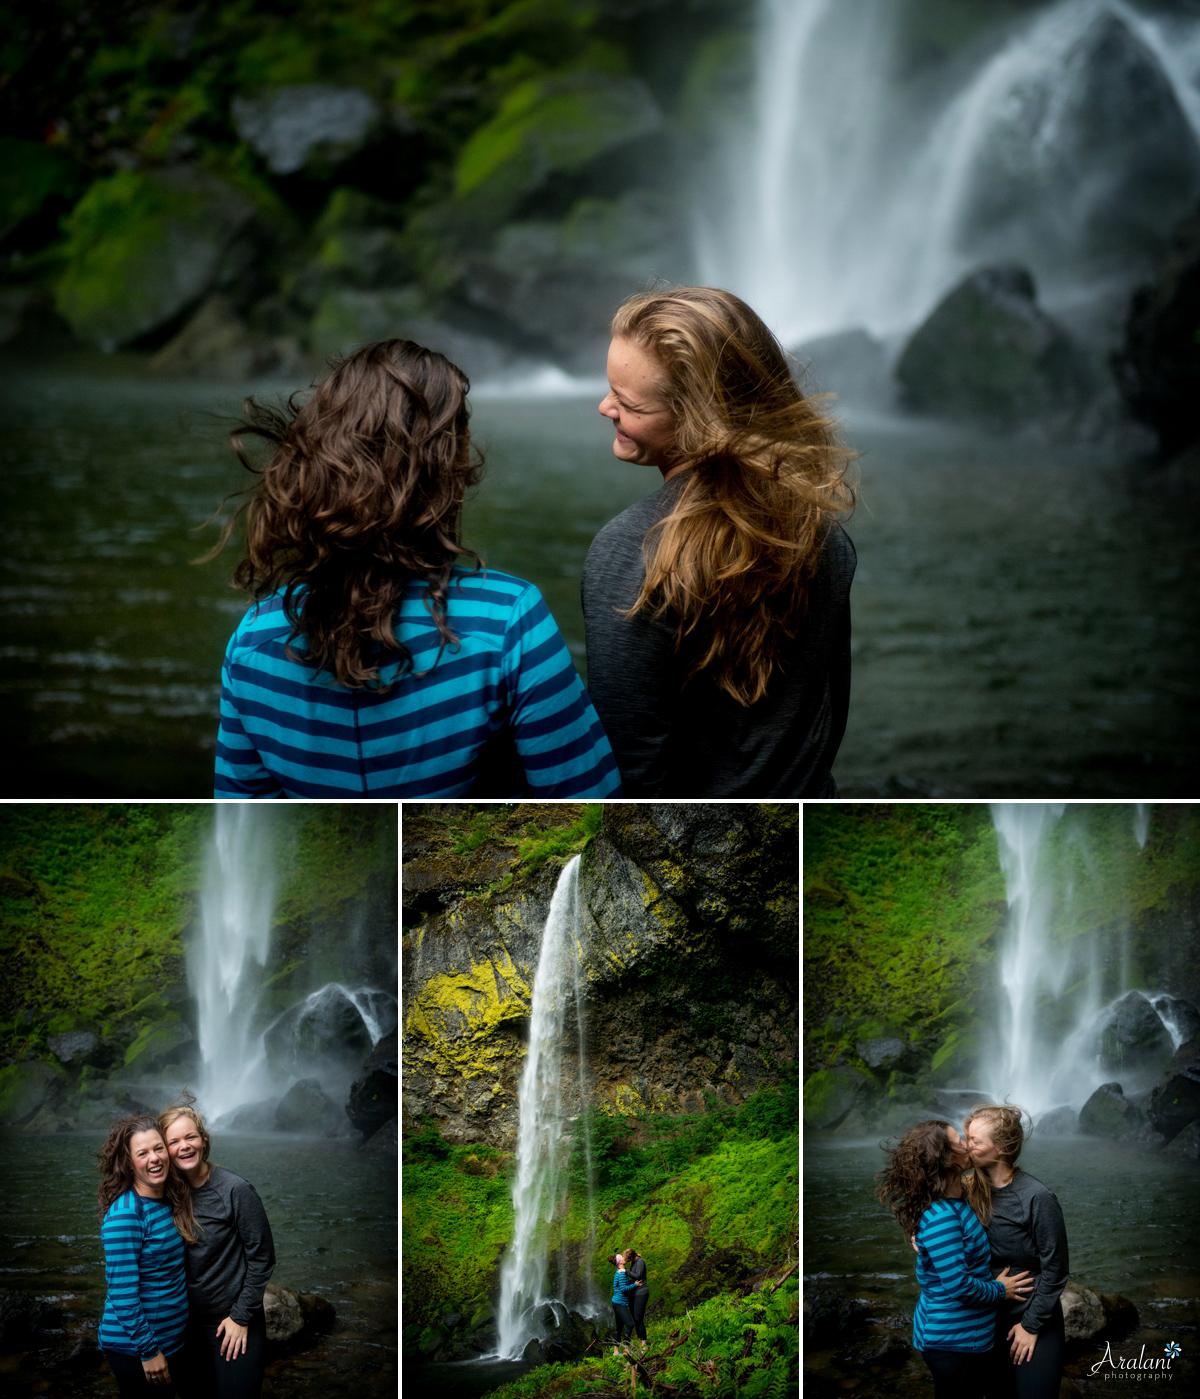 Oregon_Waterfall_Engagement0011.jpg